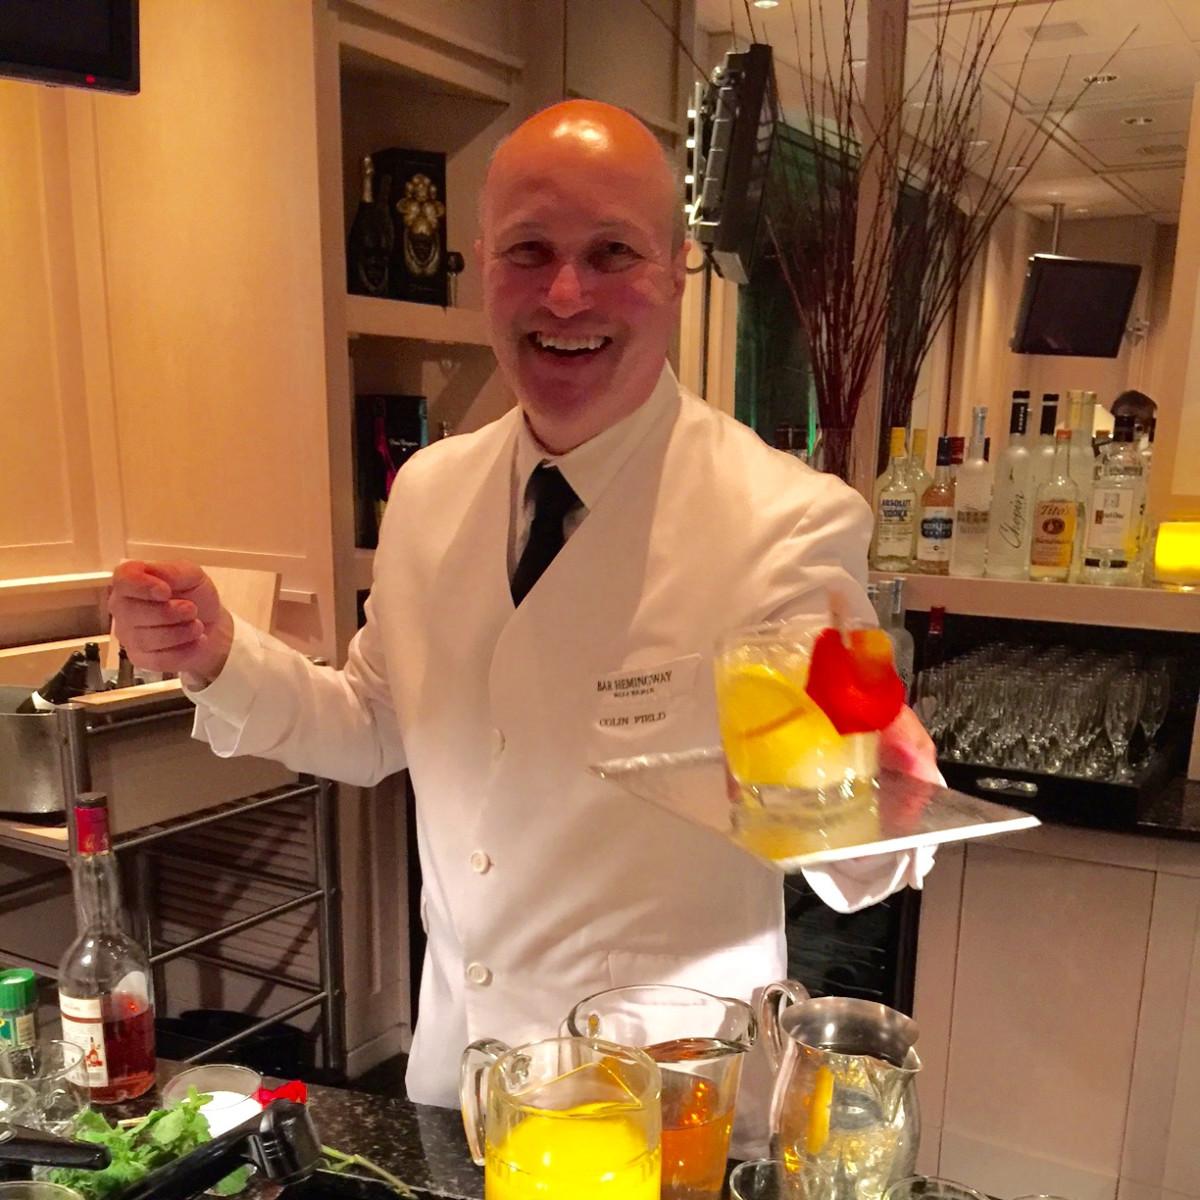 Ritz Hotel Paris, June 2016 Colin Field